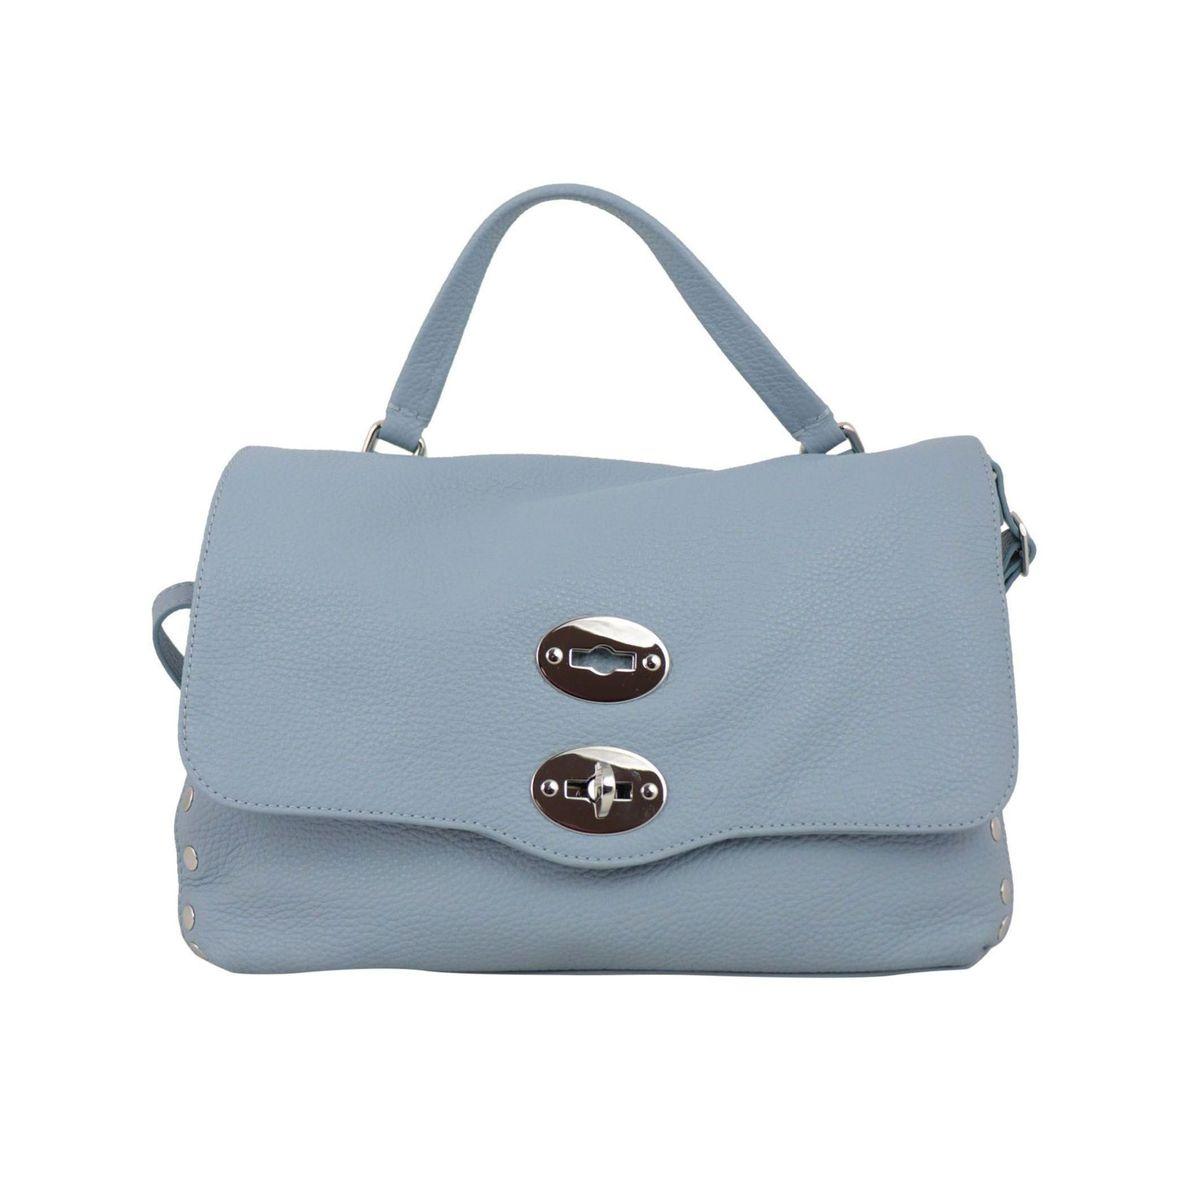 Postina S Daily bag in grained leather Light blue Zanellato